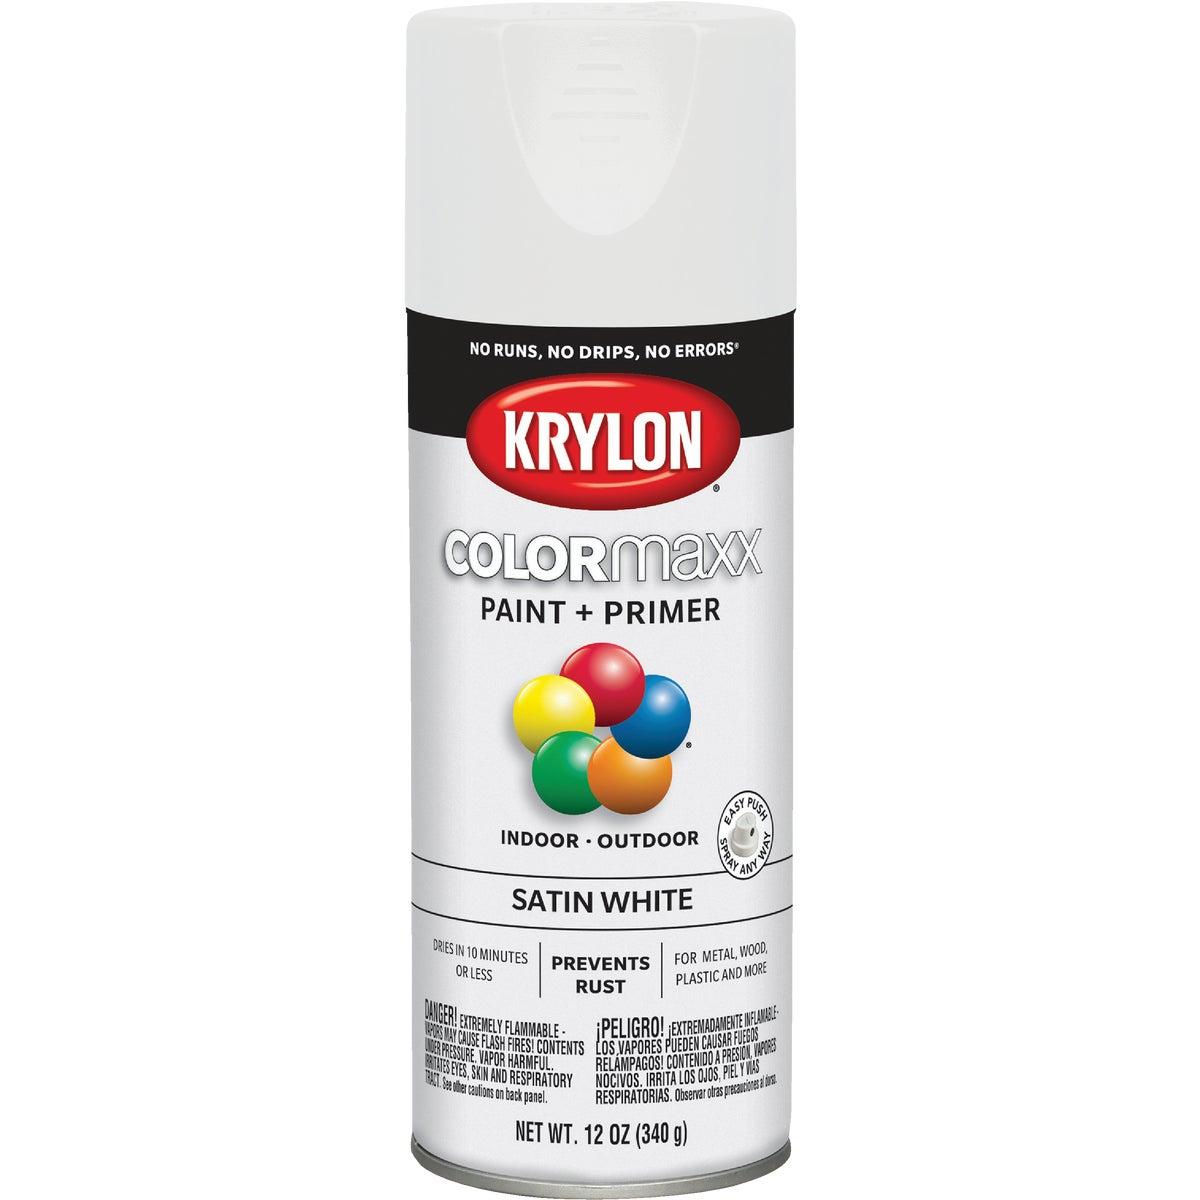 SAT WHITE SPRAY PAINT - 53564 by Krylon/consumer Div